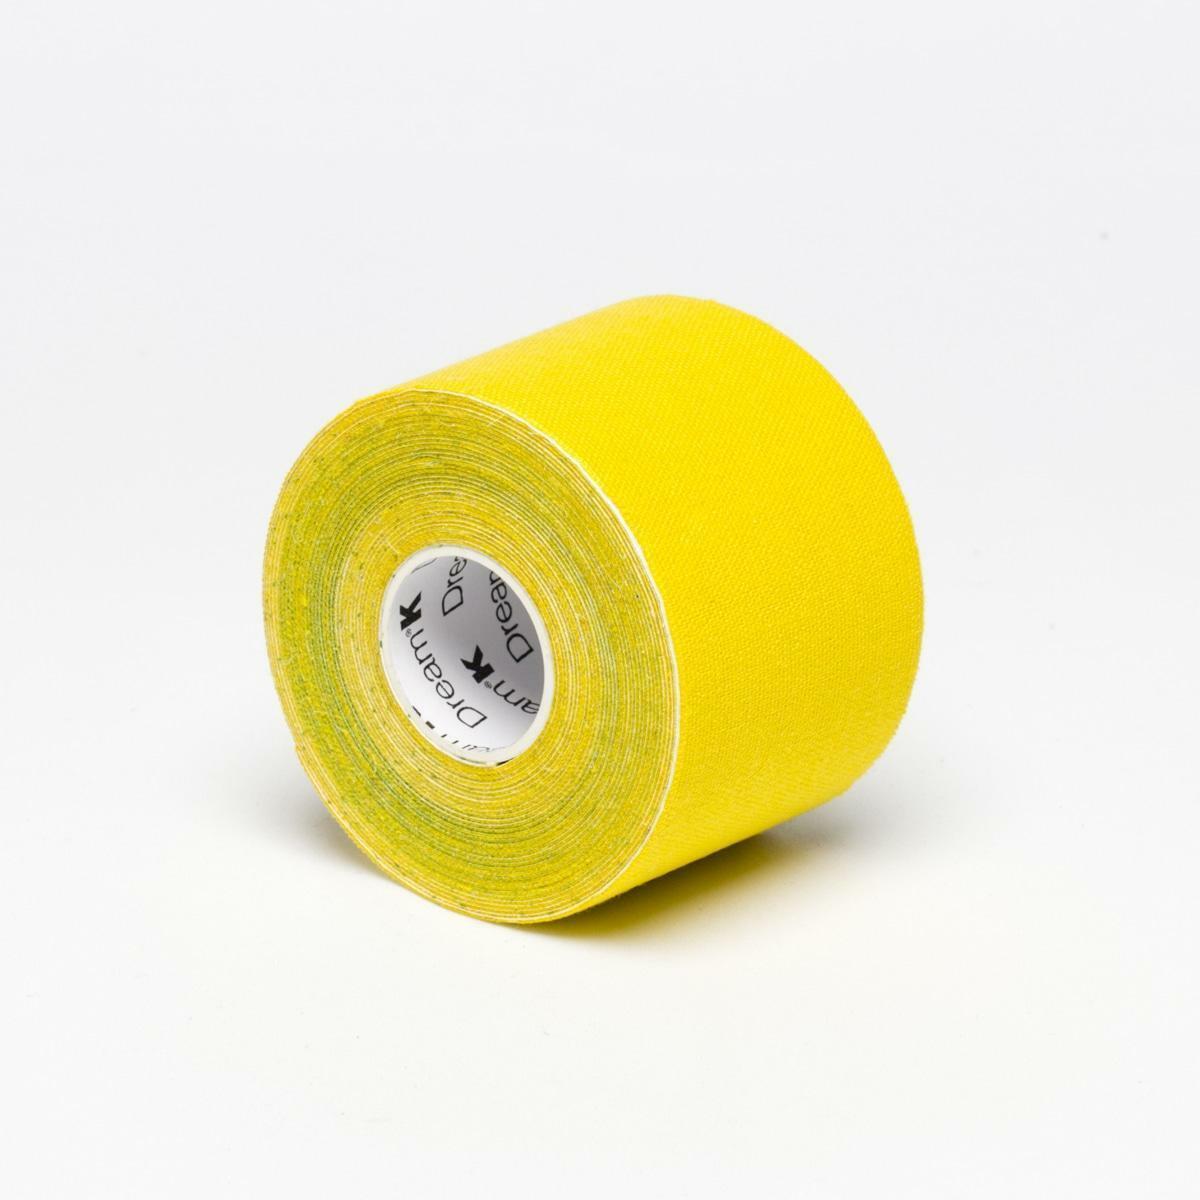 sixtus sixtus kinesio dream k giallo cm. 5 x 5 m.